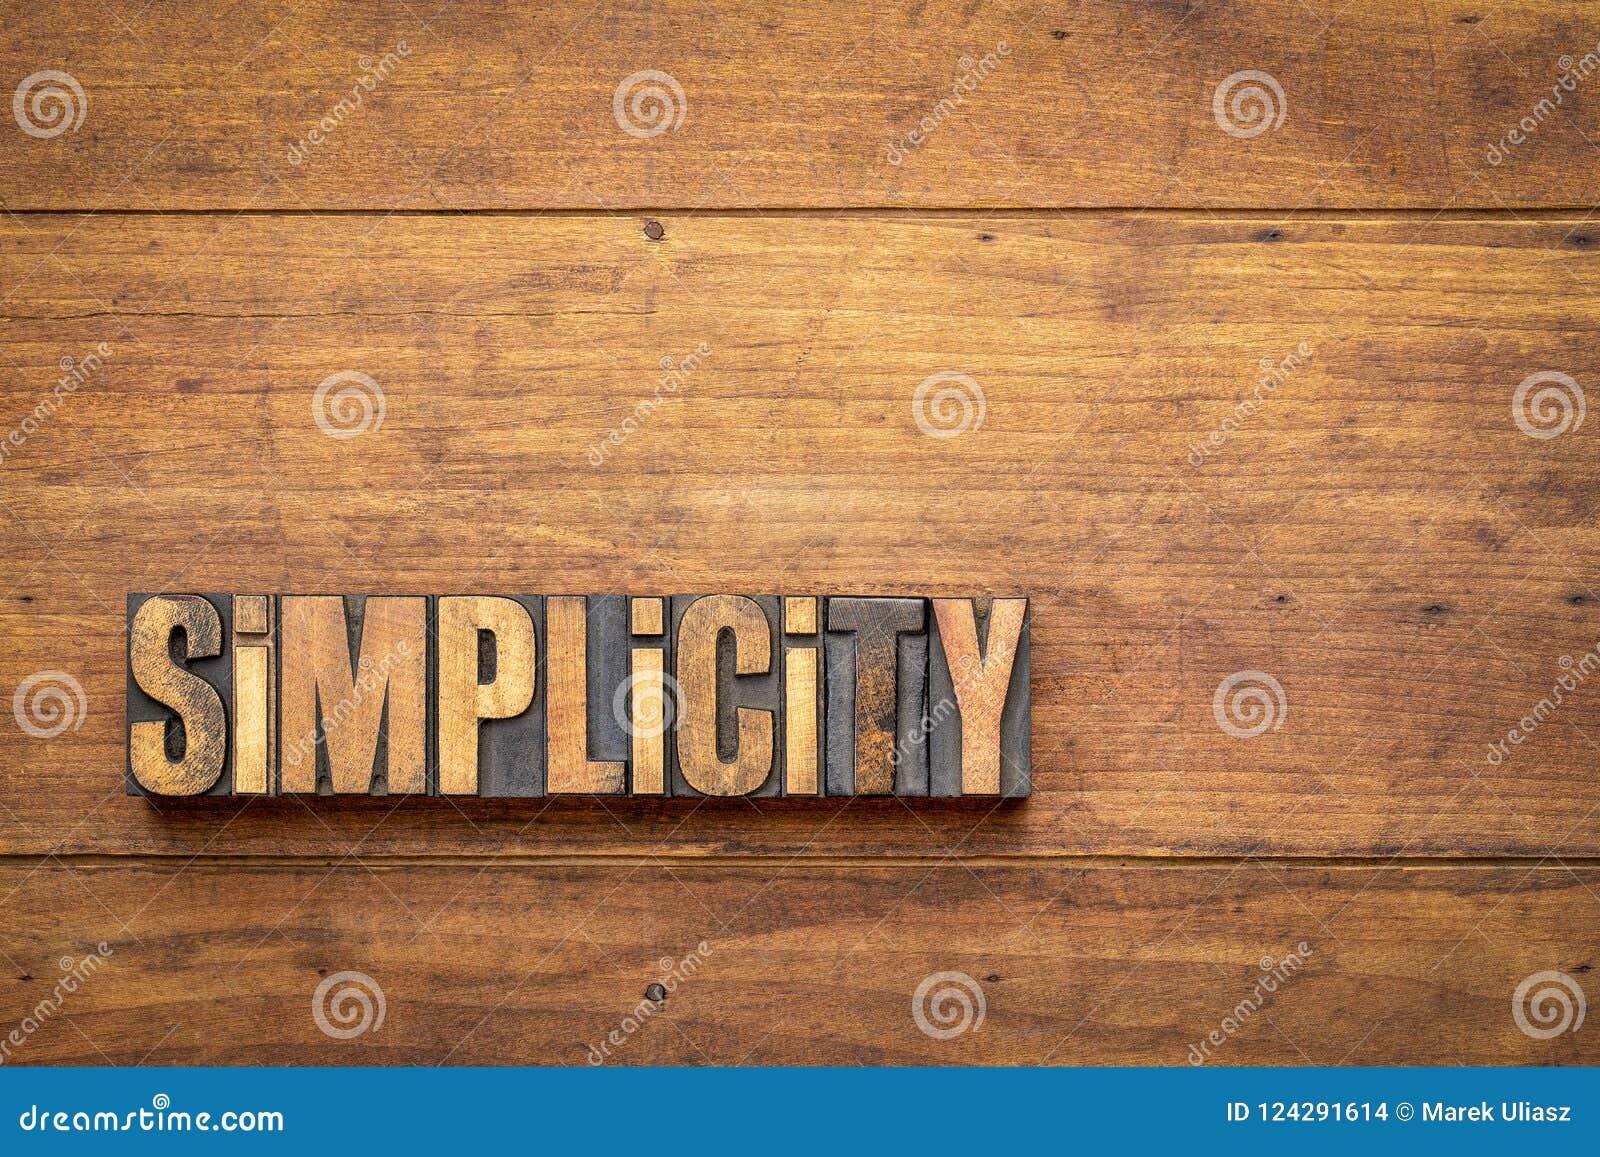 Enkelhetsordabstrakt begrepp